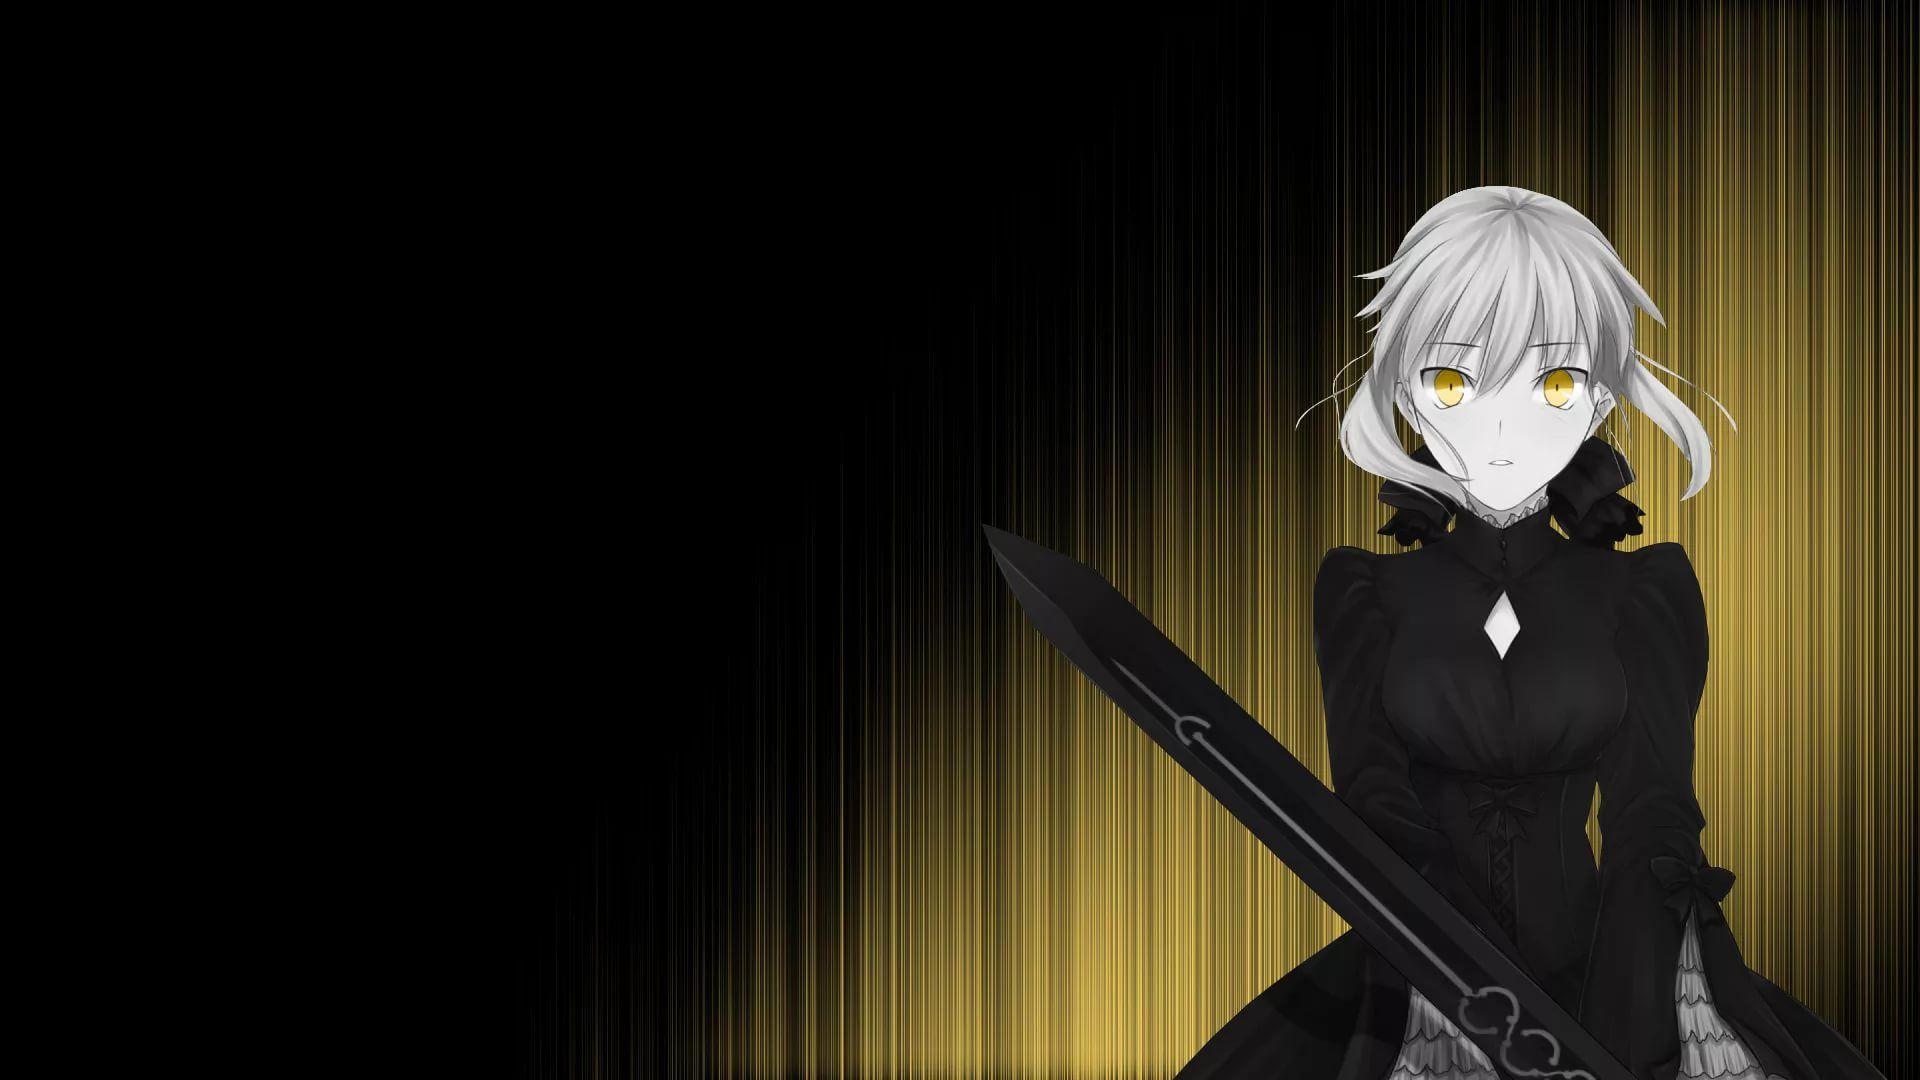 Dark Anime Pic